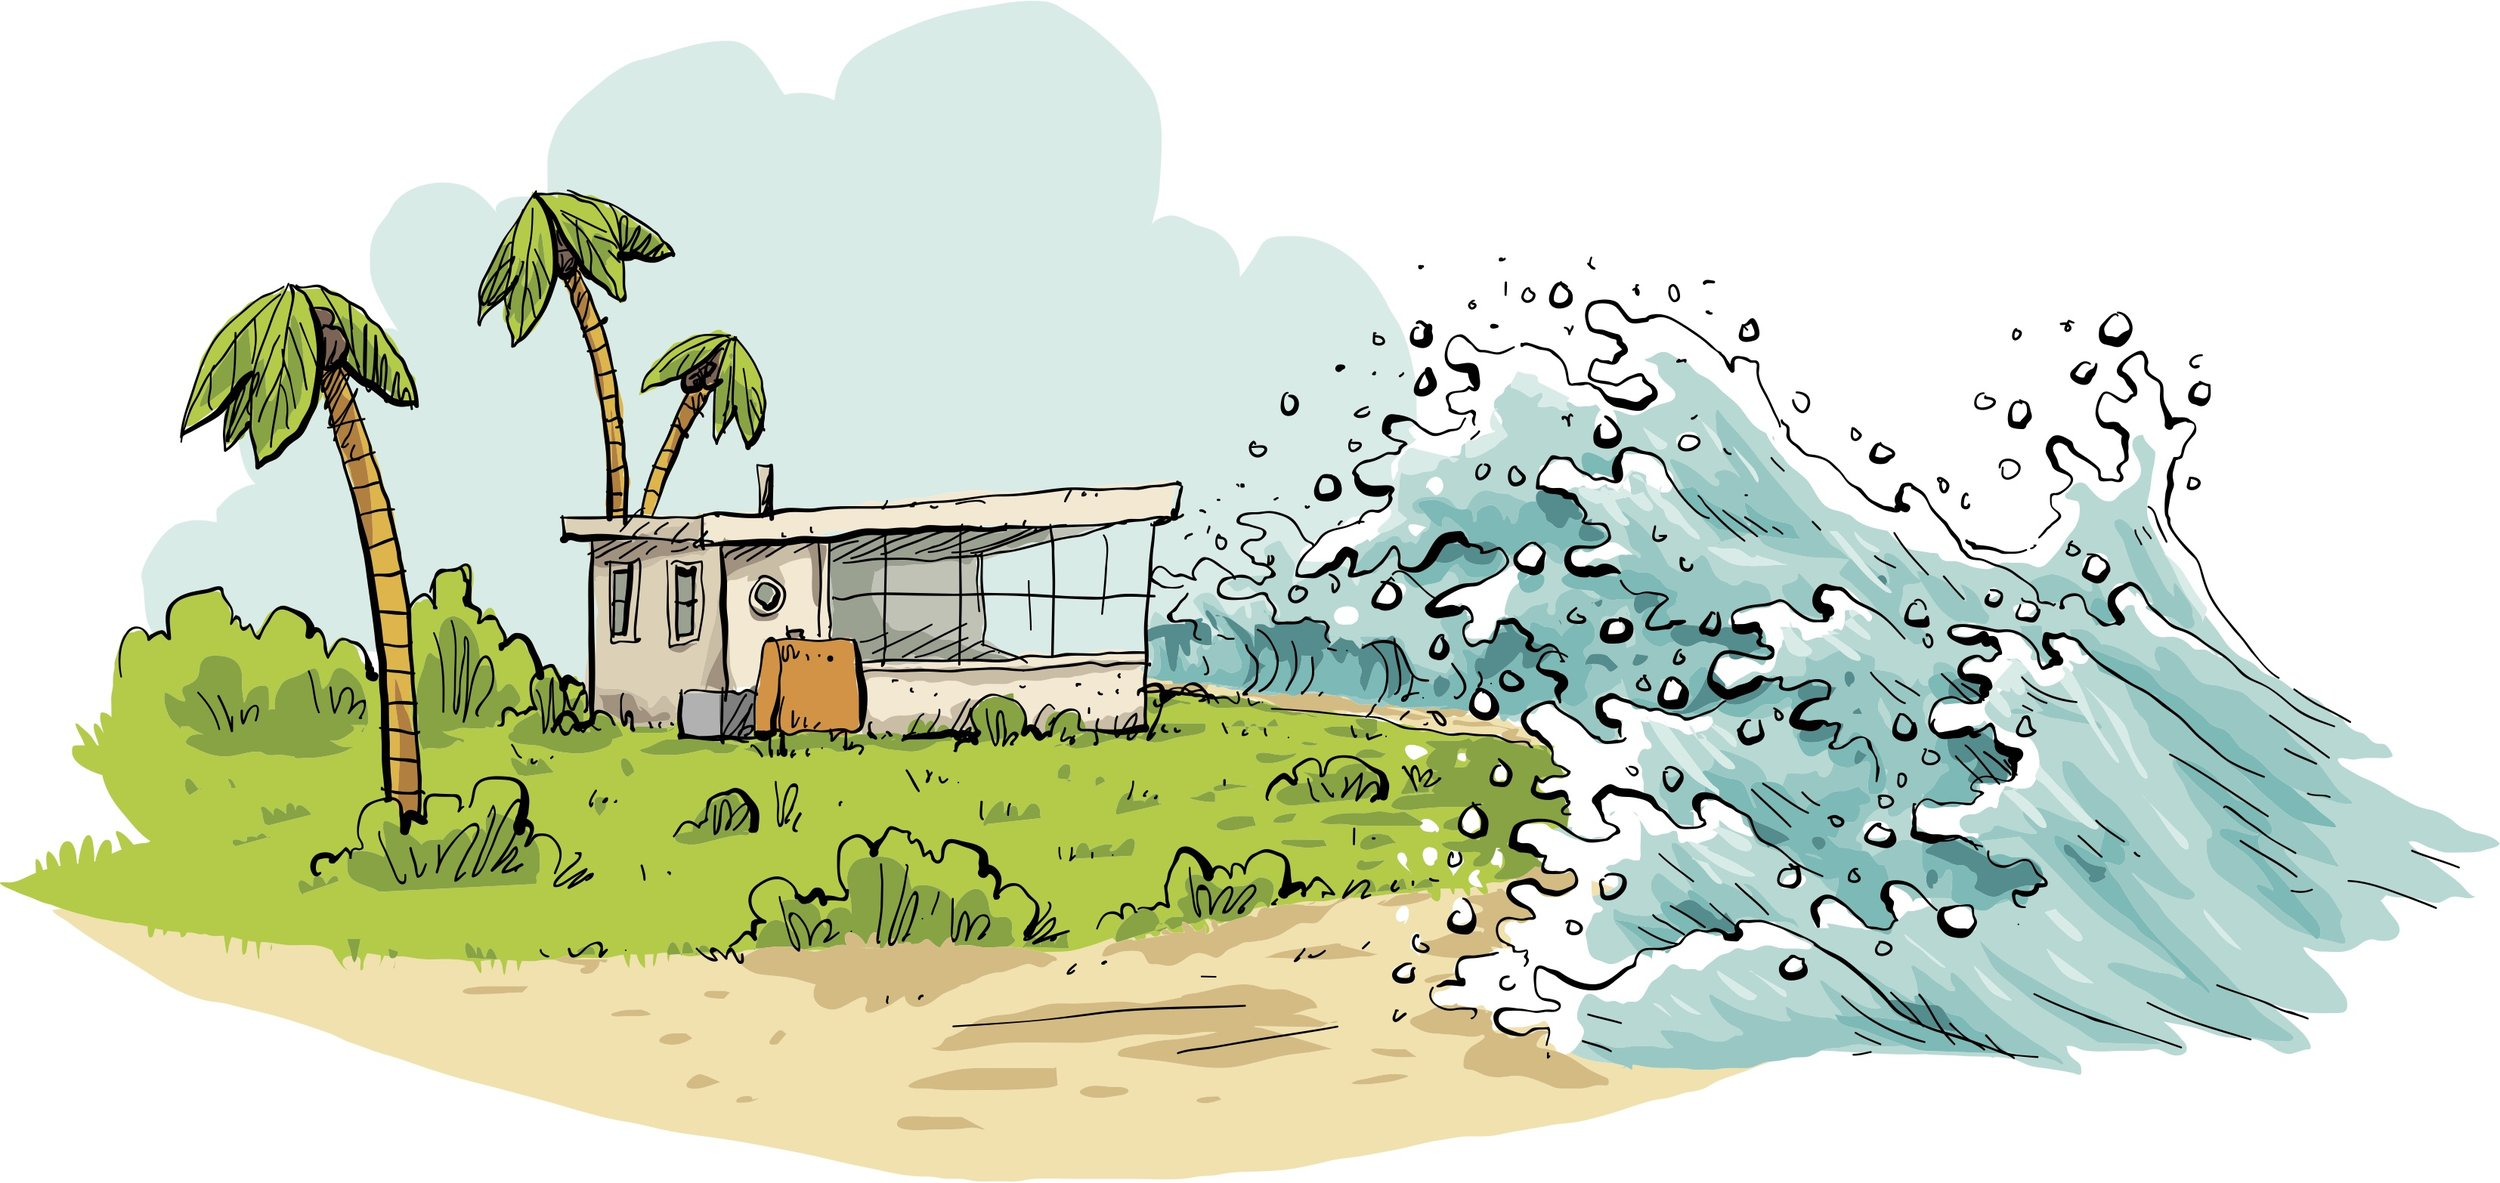 1_Ocean Flooding Cartoon.jpg